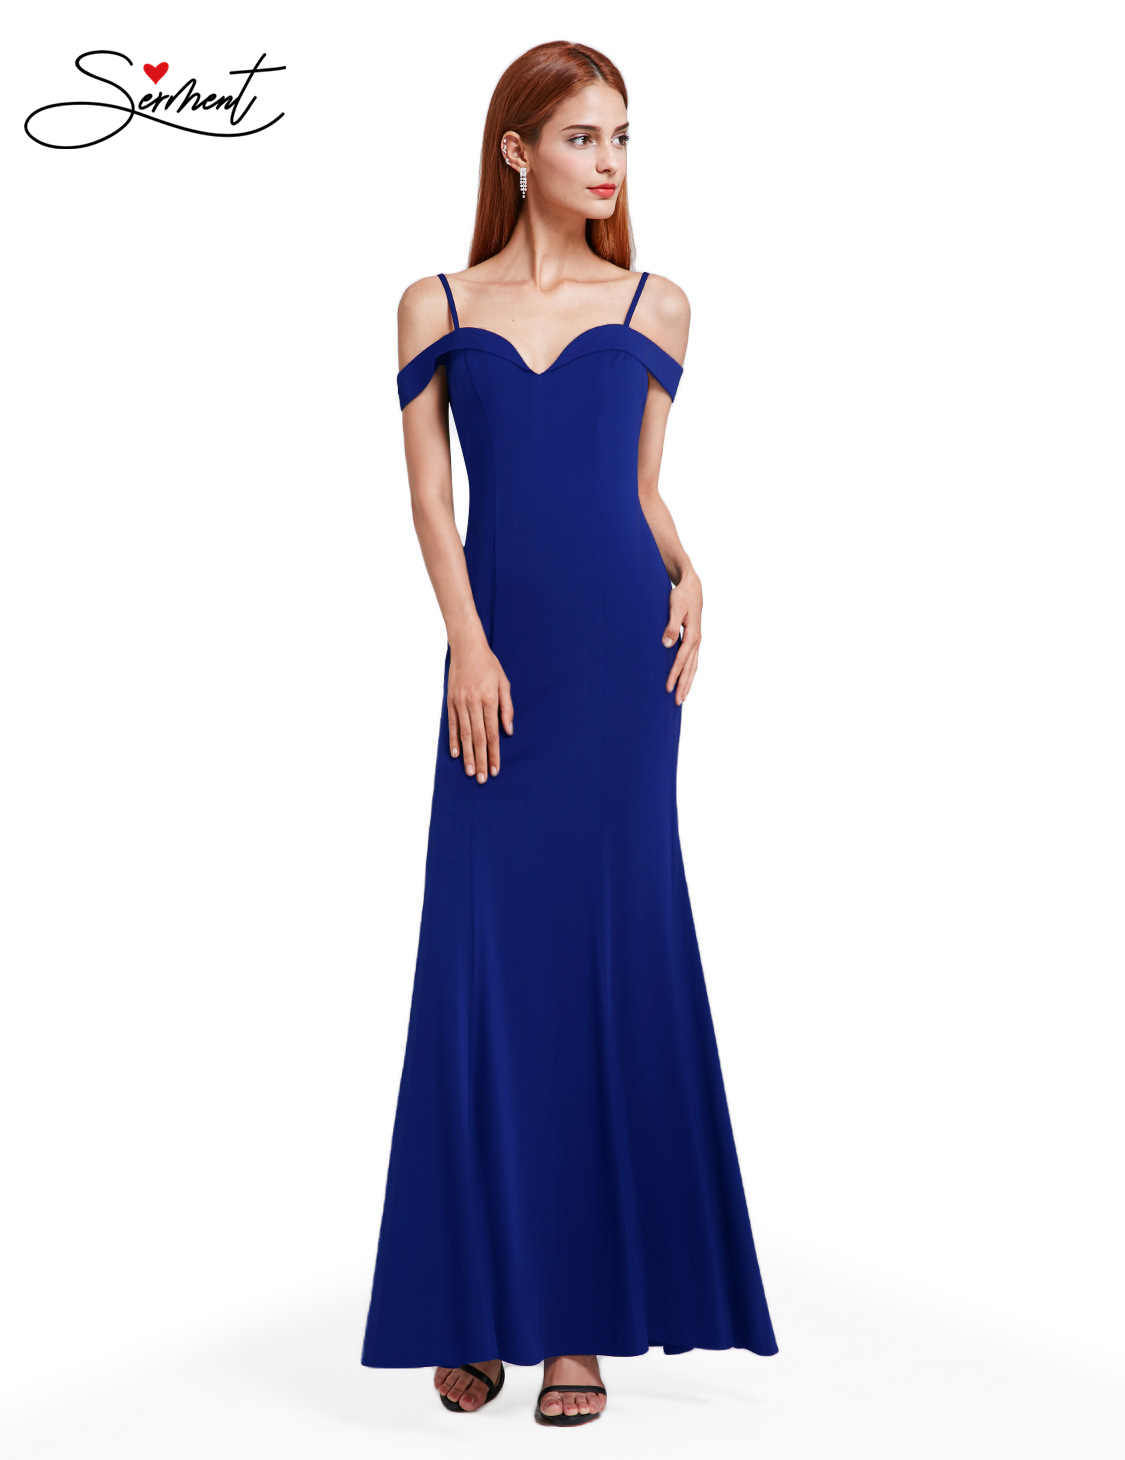 OLLYMURS Elegant Woman Evening Gown One-shoulder Strapless Shoulder Bag Hip Fishtail Evening Dress Suitable For Formal Parties